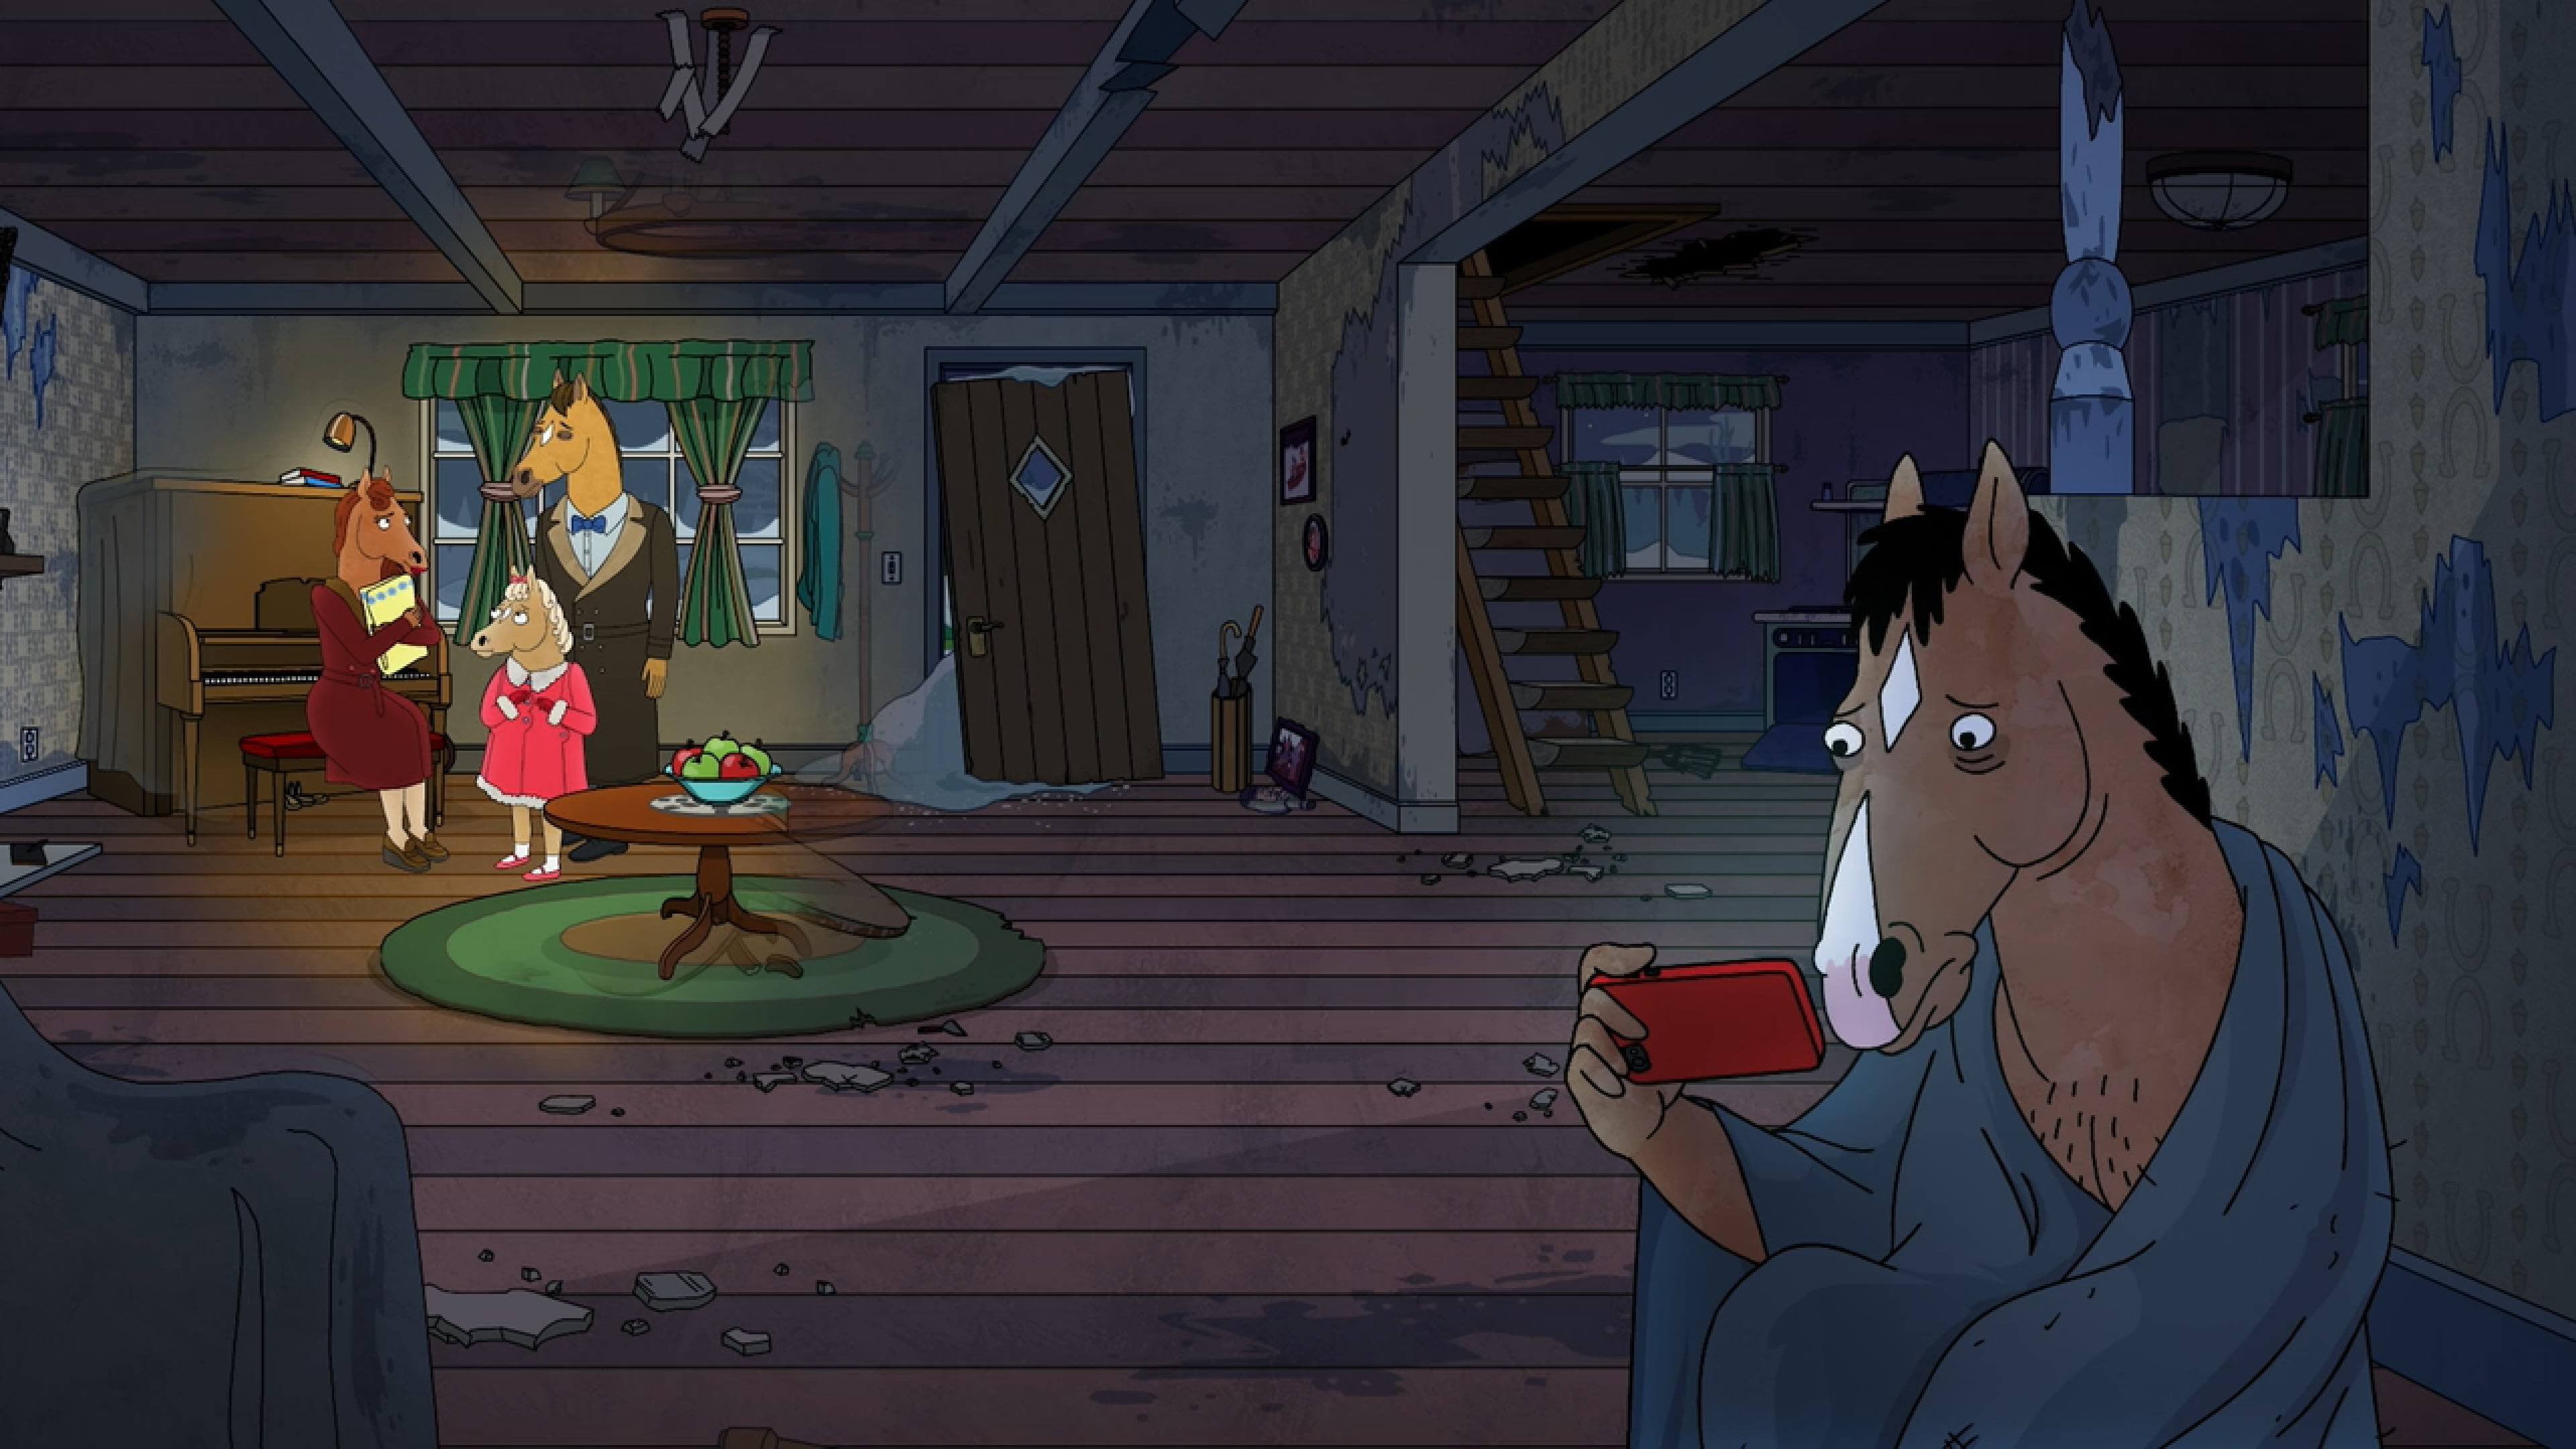 Episode Highlights: Bojack Horseman Season 4, Episode 2 - The Old Sugarman Place